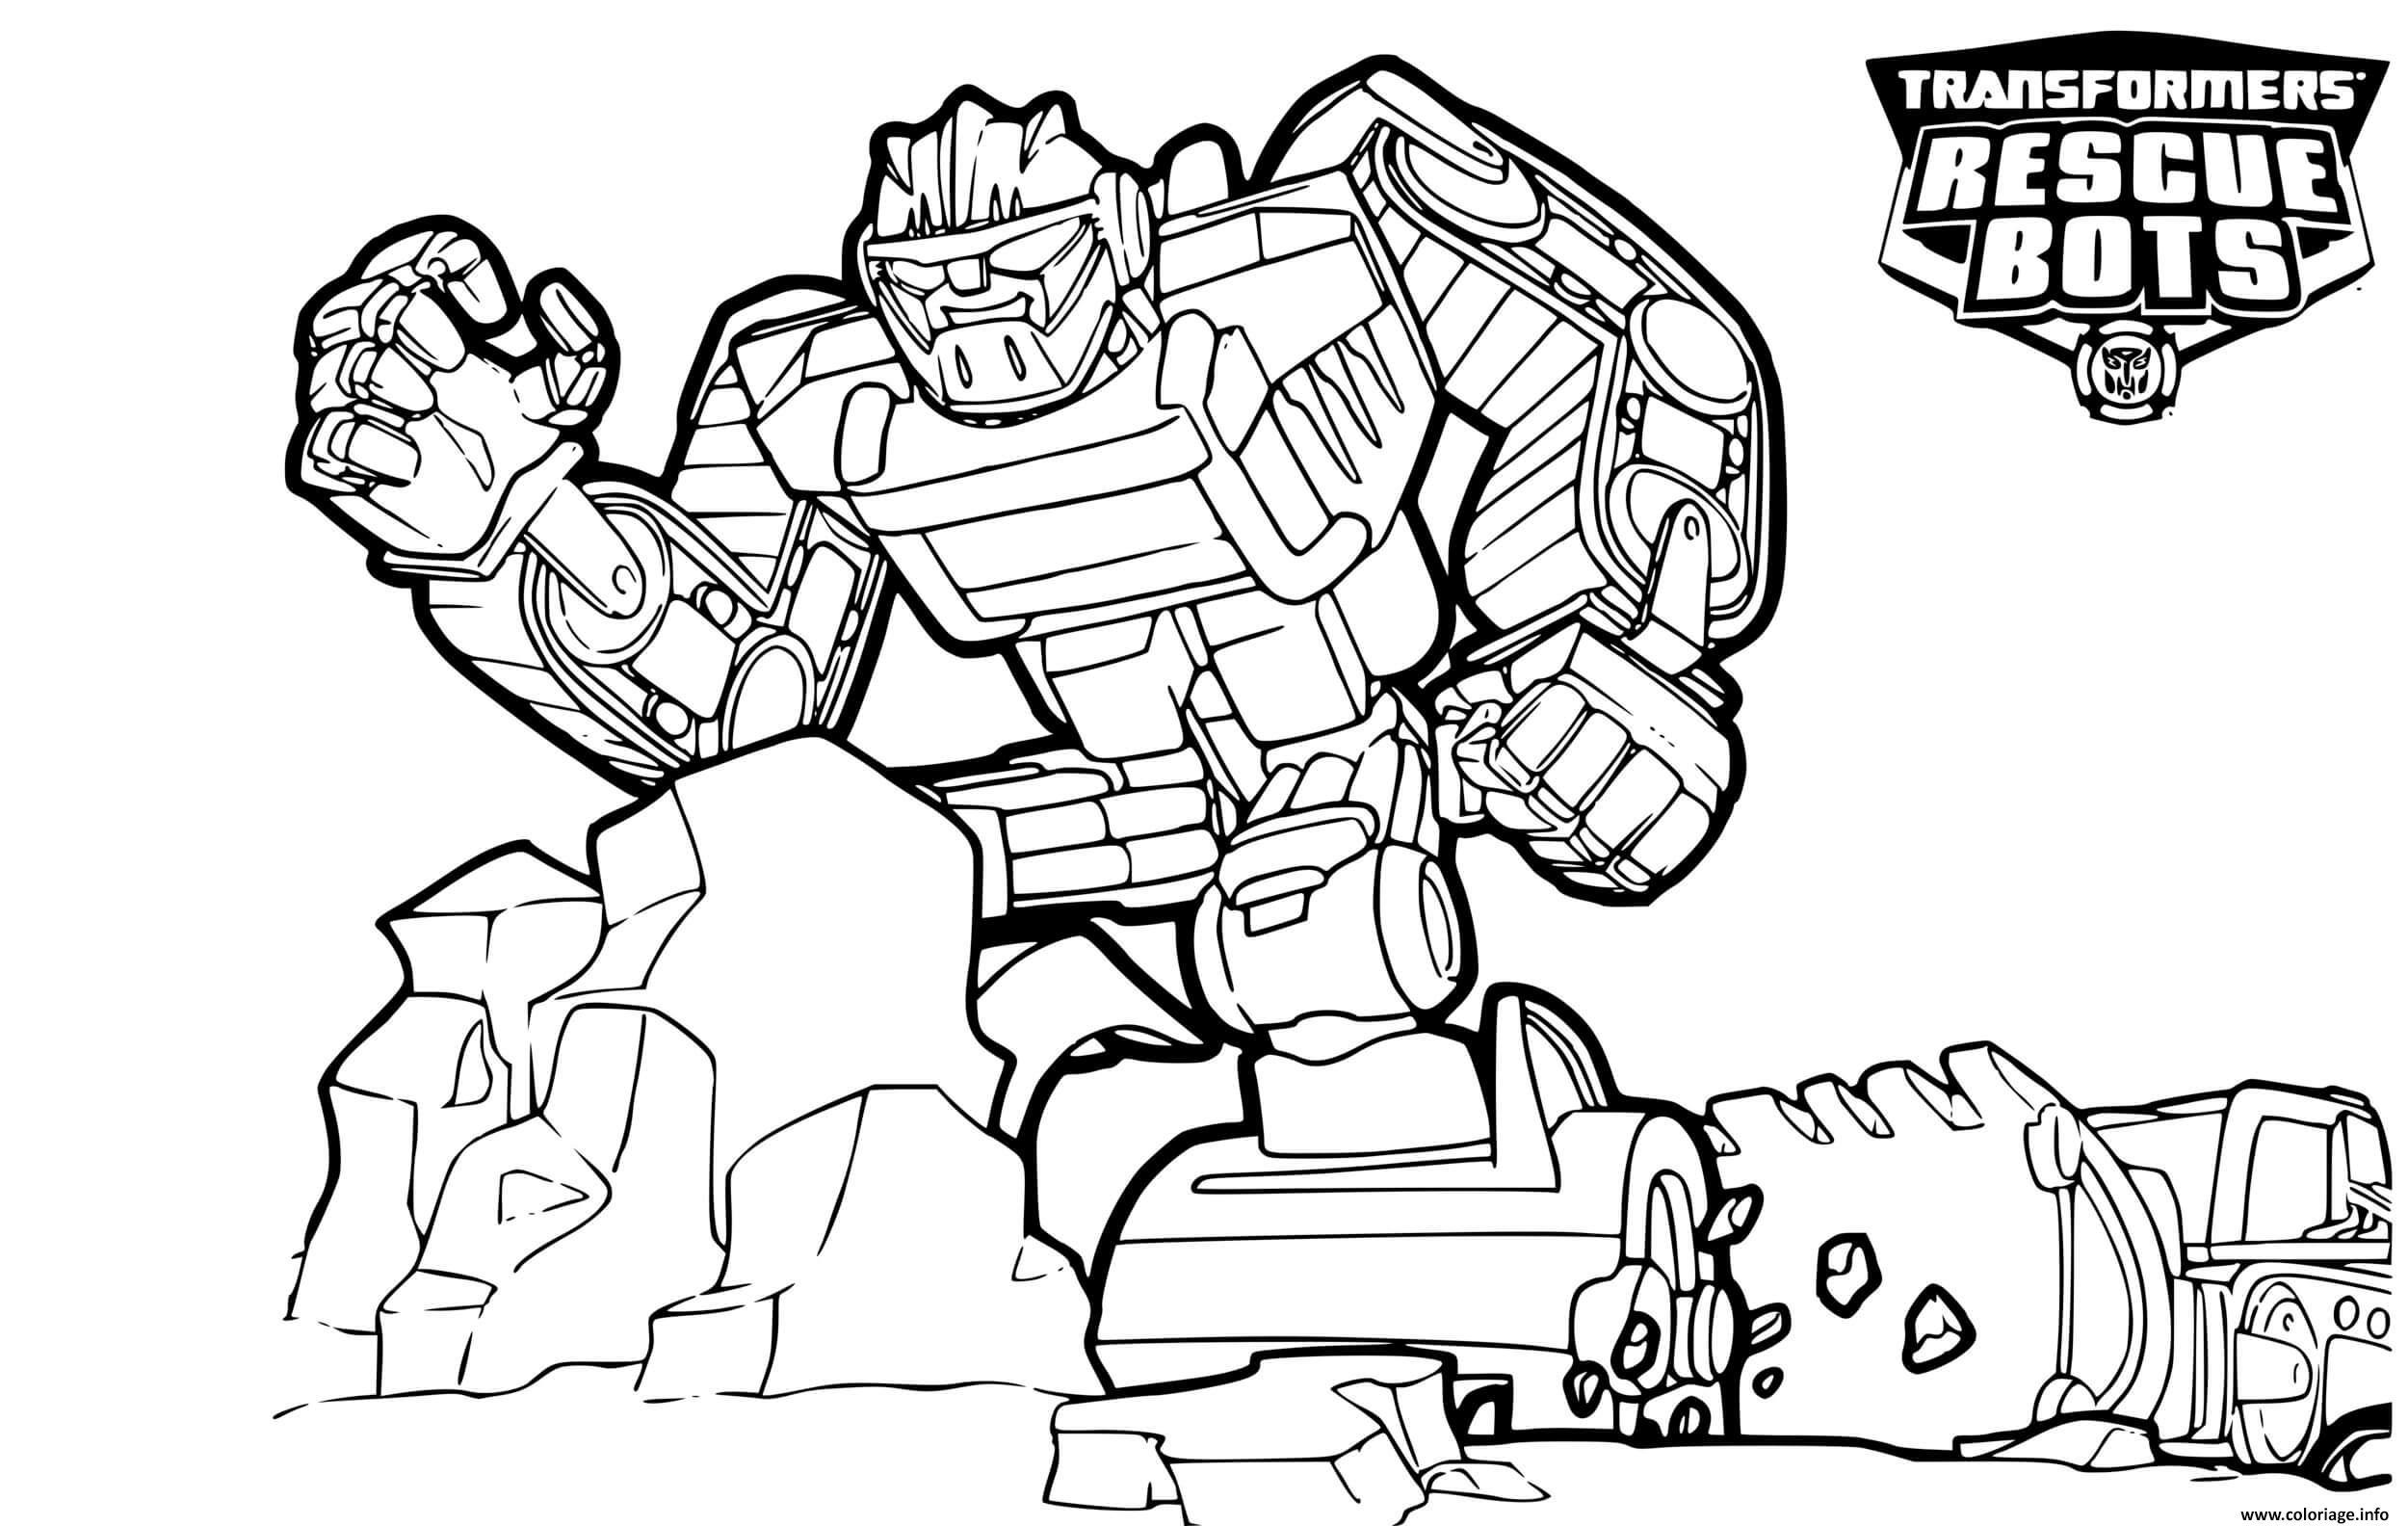 Coloriage Transformers Rescue Bots Boulder Line Drawing Dessin Transformers A Imprimer